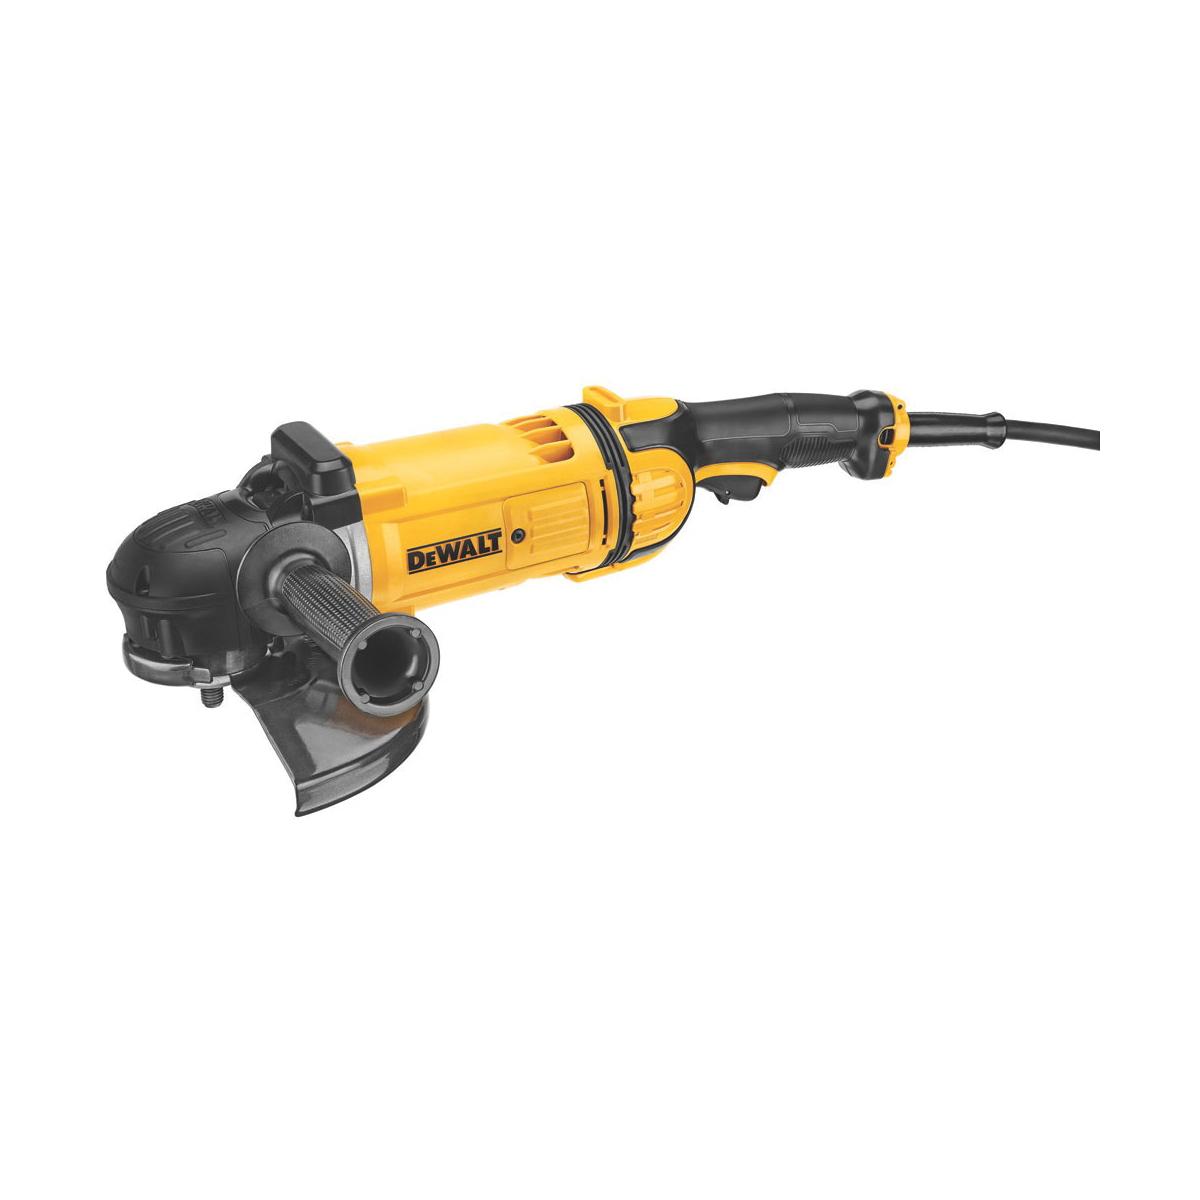 DeWALT® DWE4559CN Large Angle Grinder, 9 in Dia Wheel, 5/8-11 Arbor/Shank, 120 VAC, Yellow, Yes, Lock-Off Trigger Switch Switch